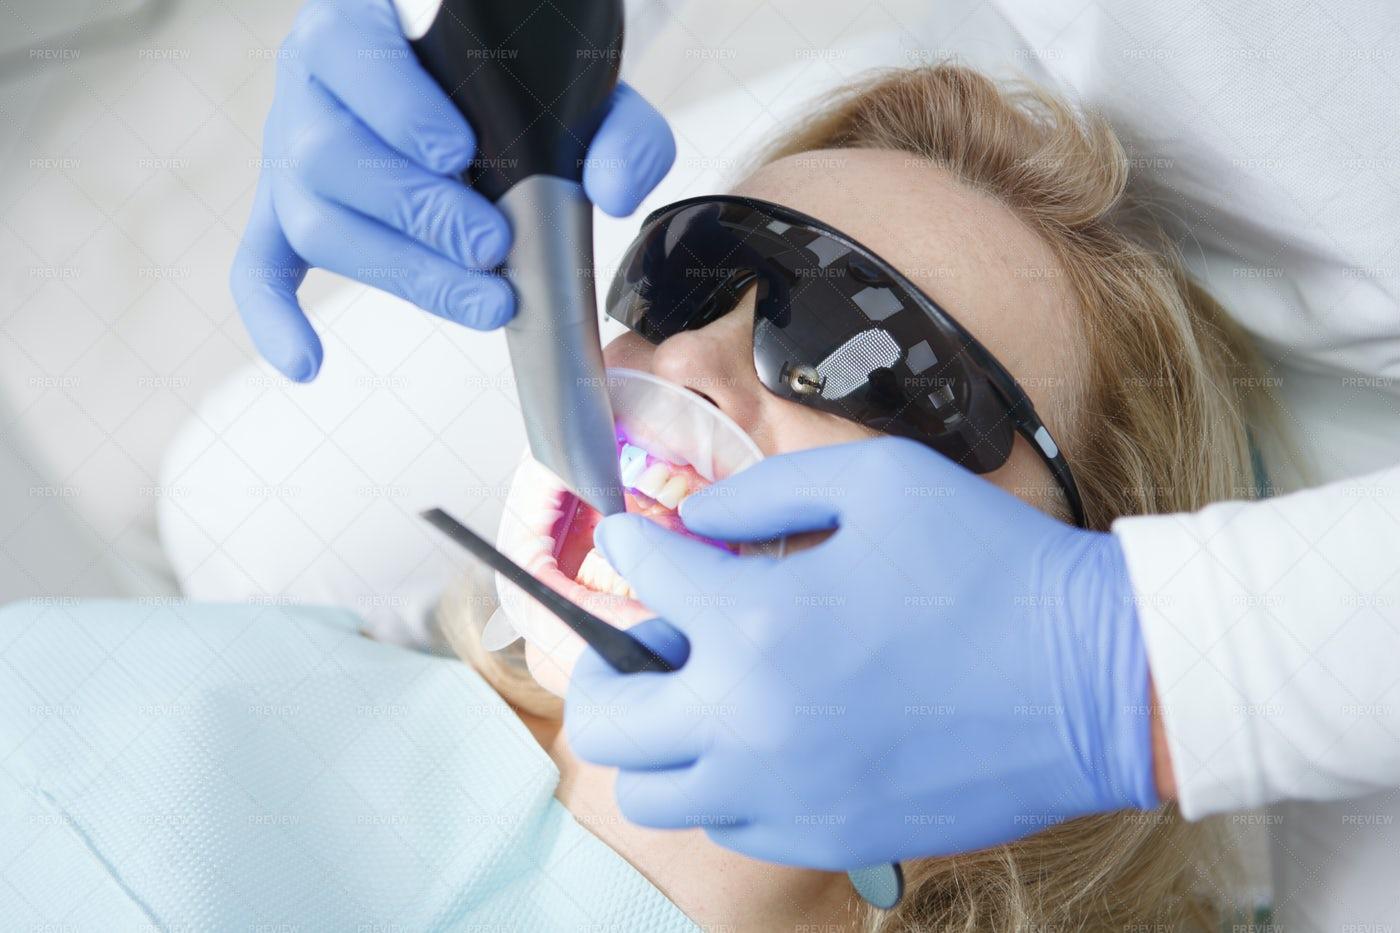 Woman Getting Dental Scanning: Stock Photos